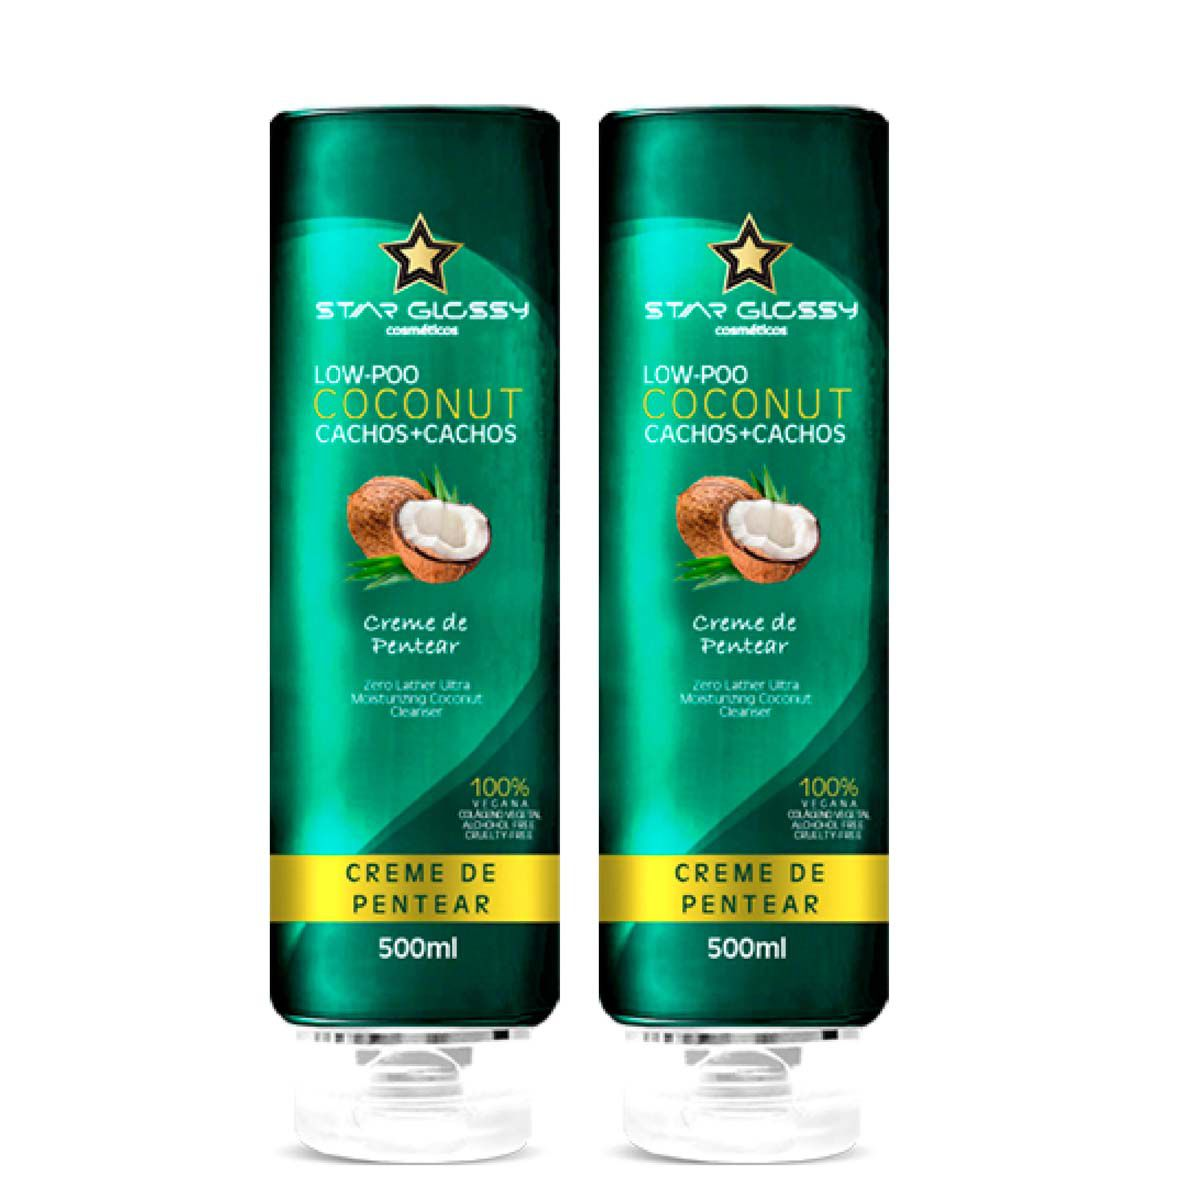 2 Cremes de Pentear - Coconut - Star Glossy - 500 ml (cada)